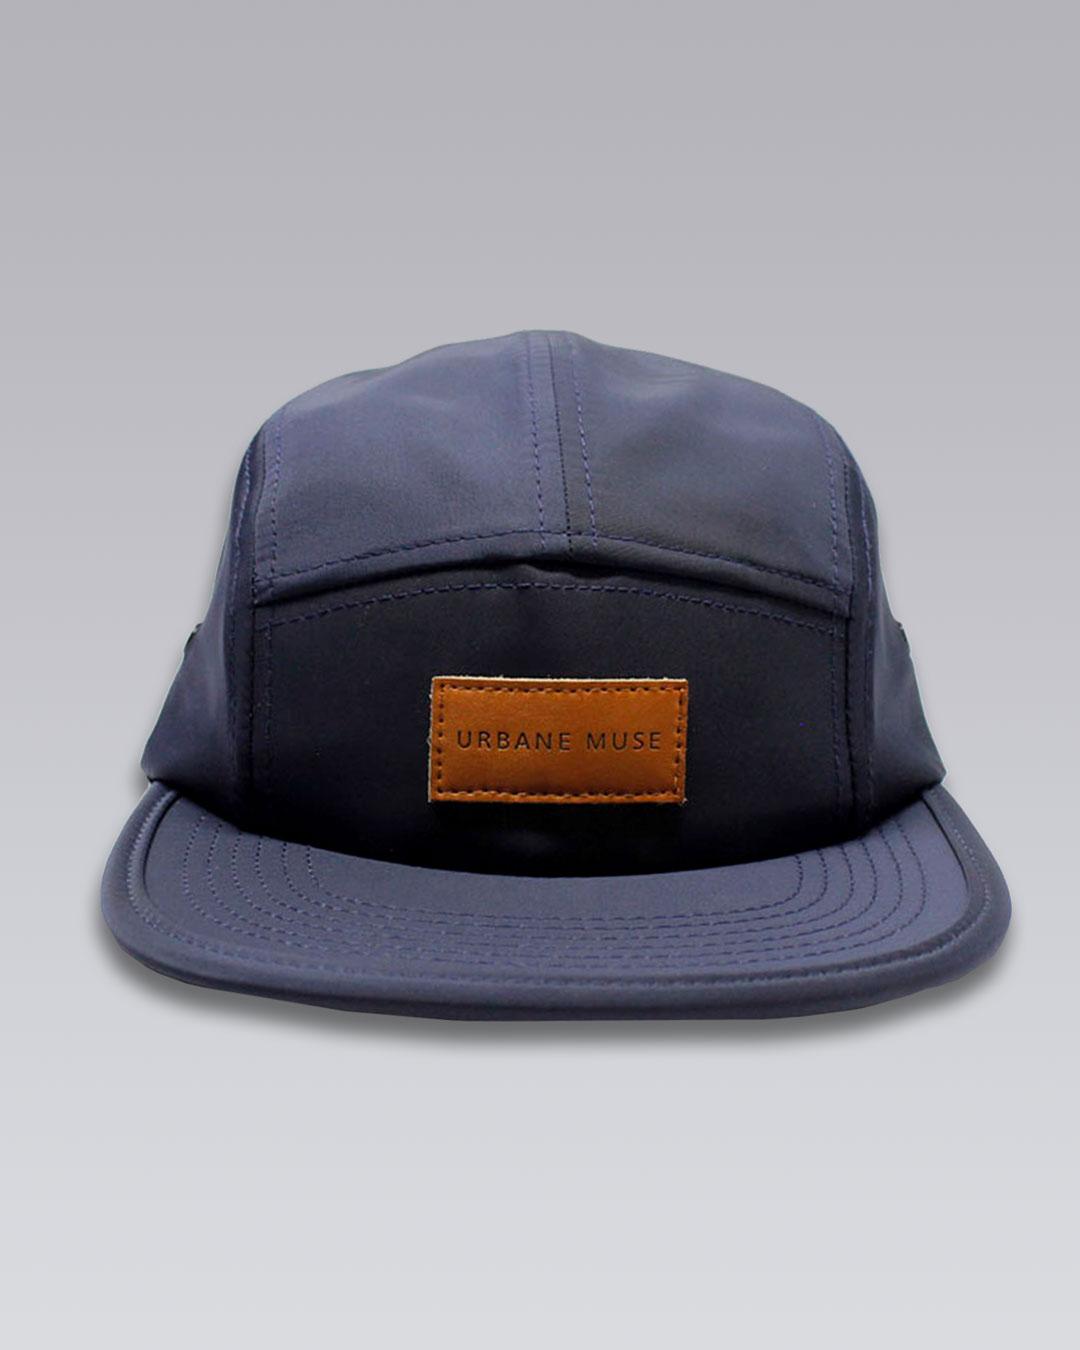 photo-1b-URBANE-MUSE-CHRIS-SMITH-Navy-UM-nylon-five-panel-hat